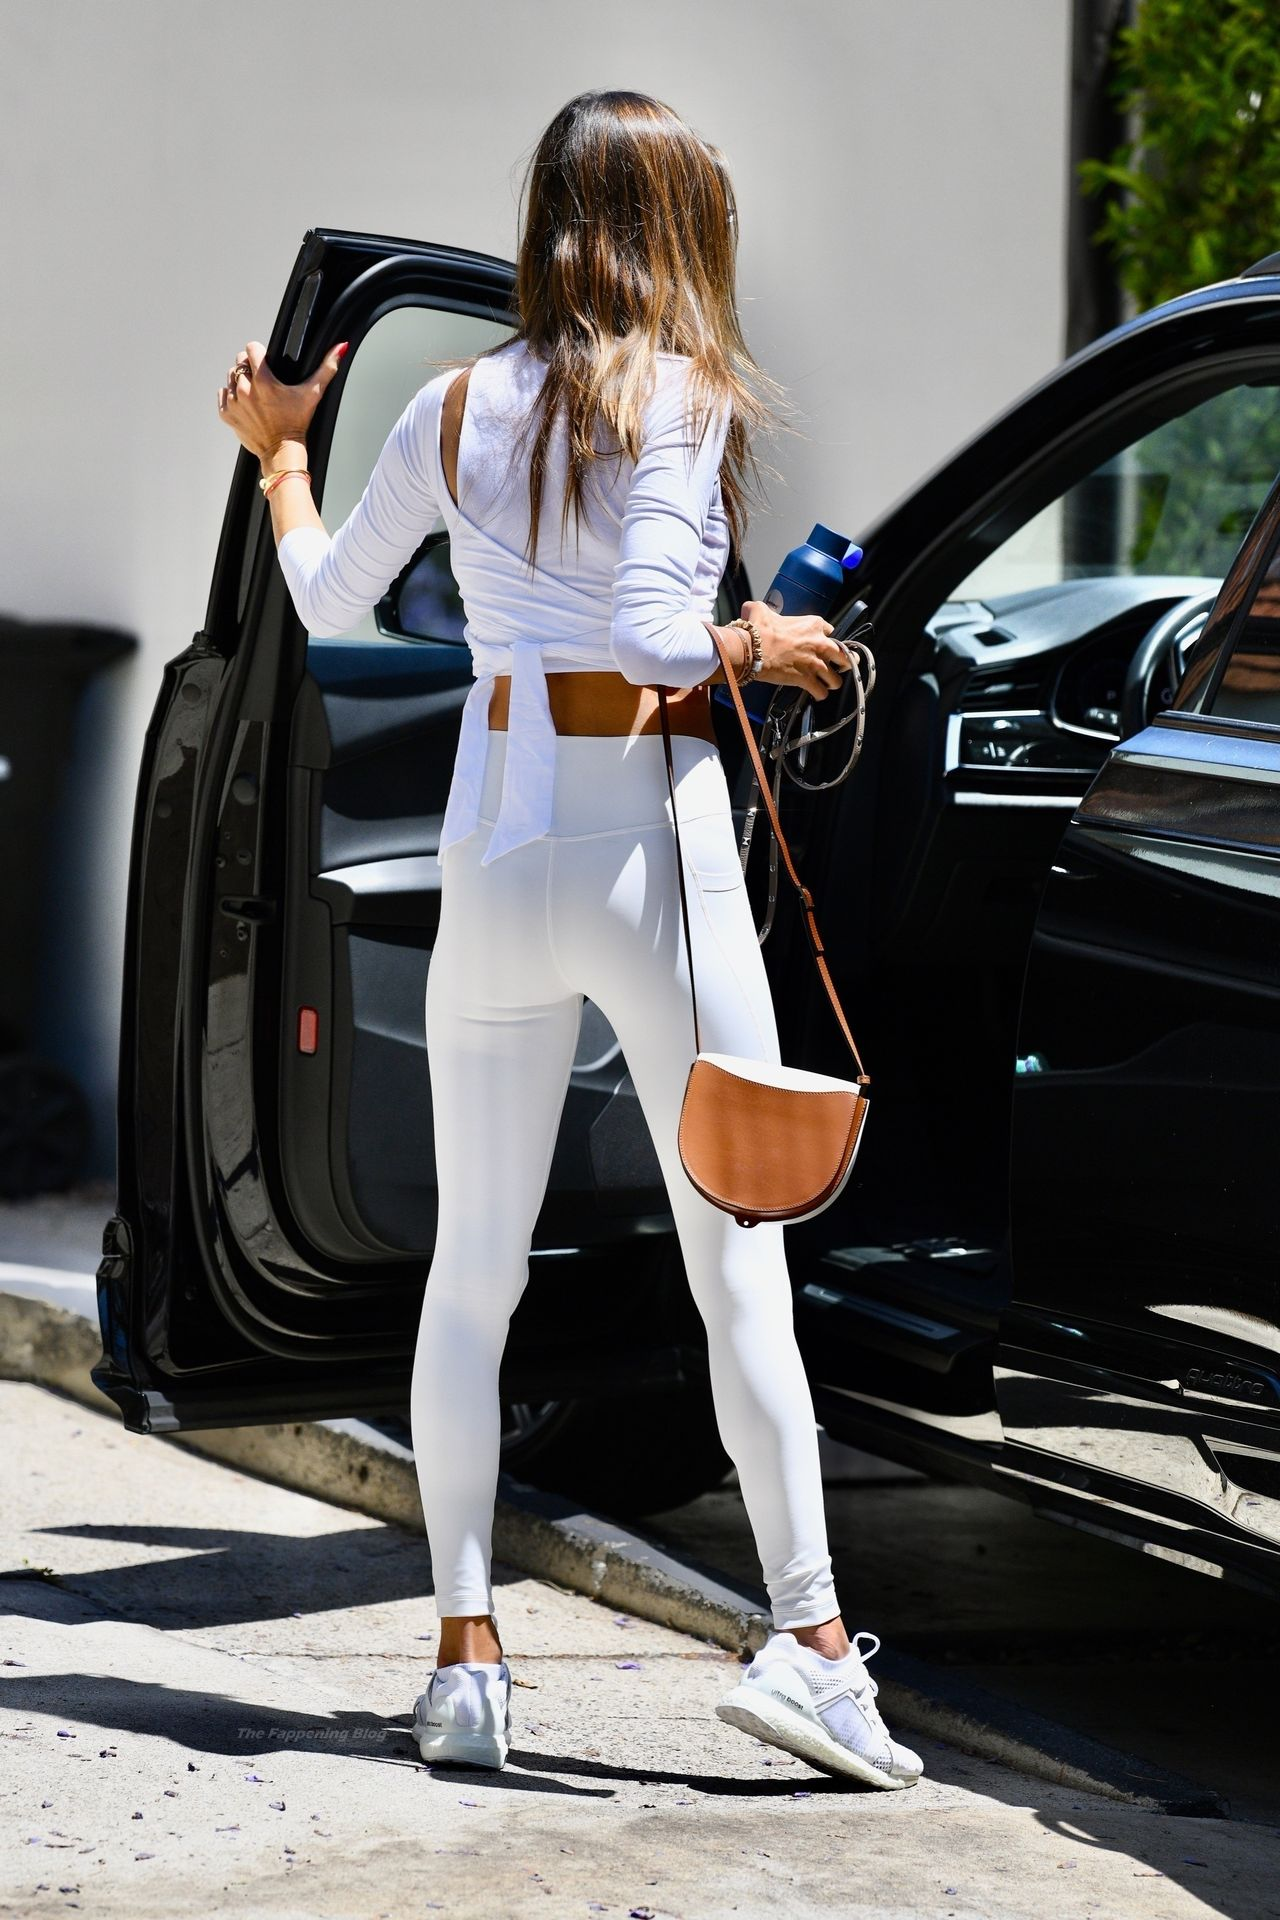 Alessandra-Ambrosio-Sexy-75-leakedmodels.com_.jpg